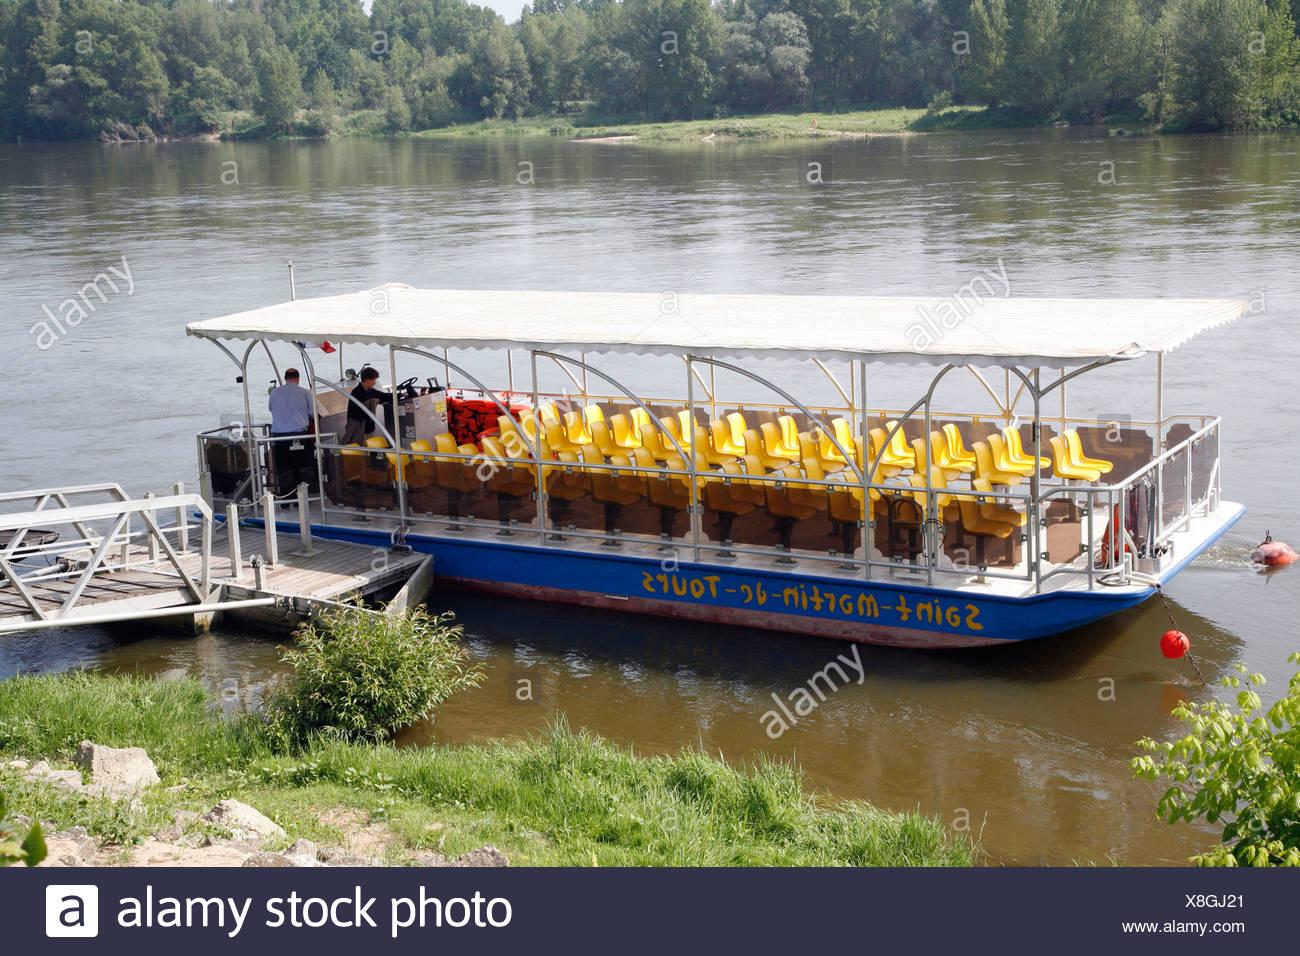 "Boat trip on the Loire River ""Saint-Martin-de-Tours"" bateau, Rochecorbon, France, Europe Stock Photo"